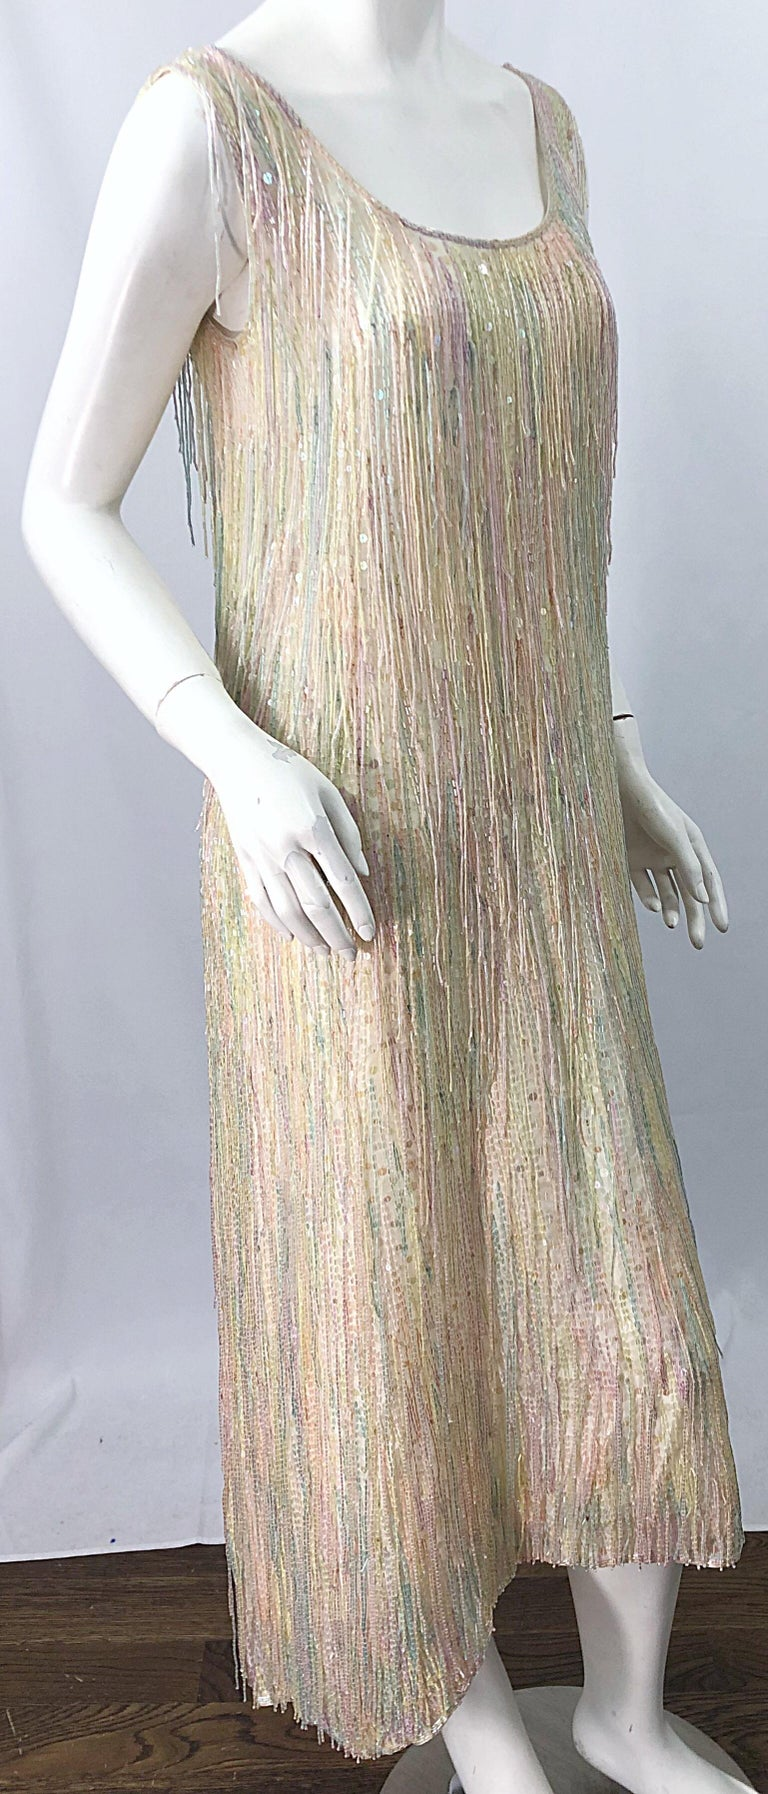 Halston MET Musuem 1970s Fully Fringed Beaded Flapper Style Vintage 70s Dress For Sale 4